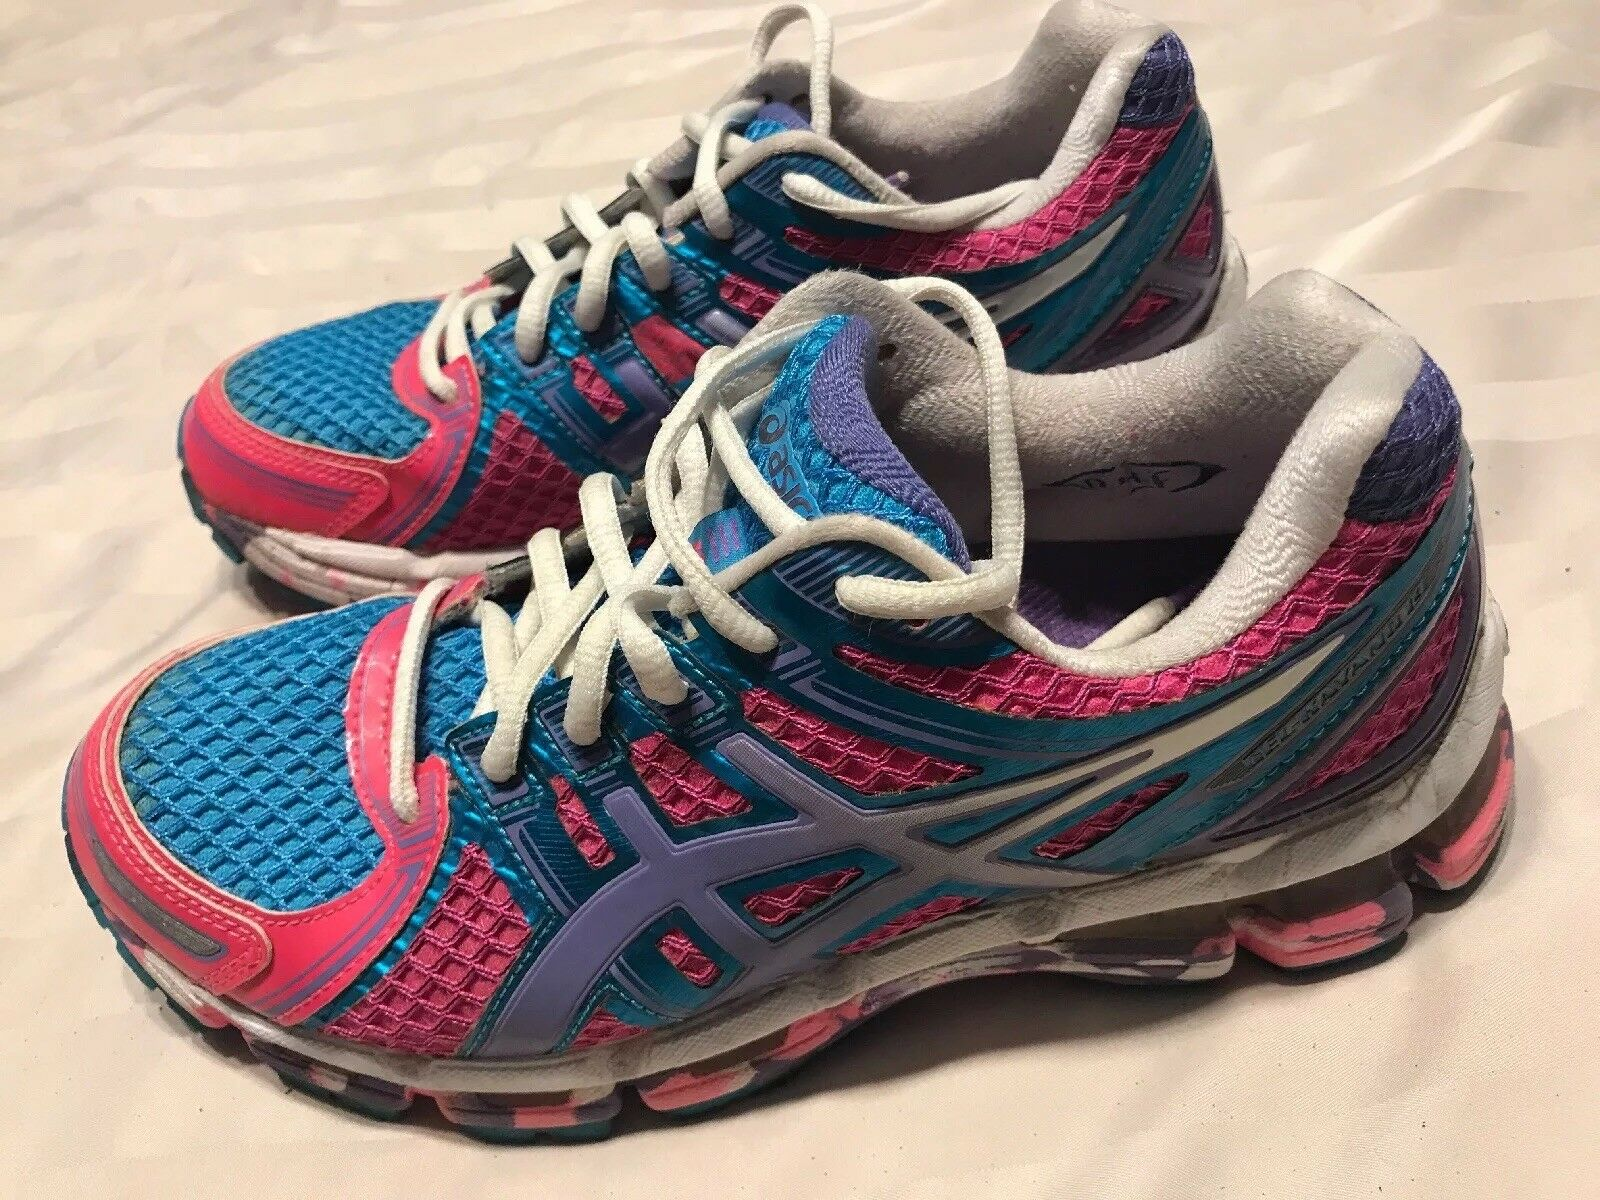 Asics Gel Kayano 19 Women's Metallic bluee Pink Purple Running shoes Sz 7 SC8